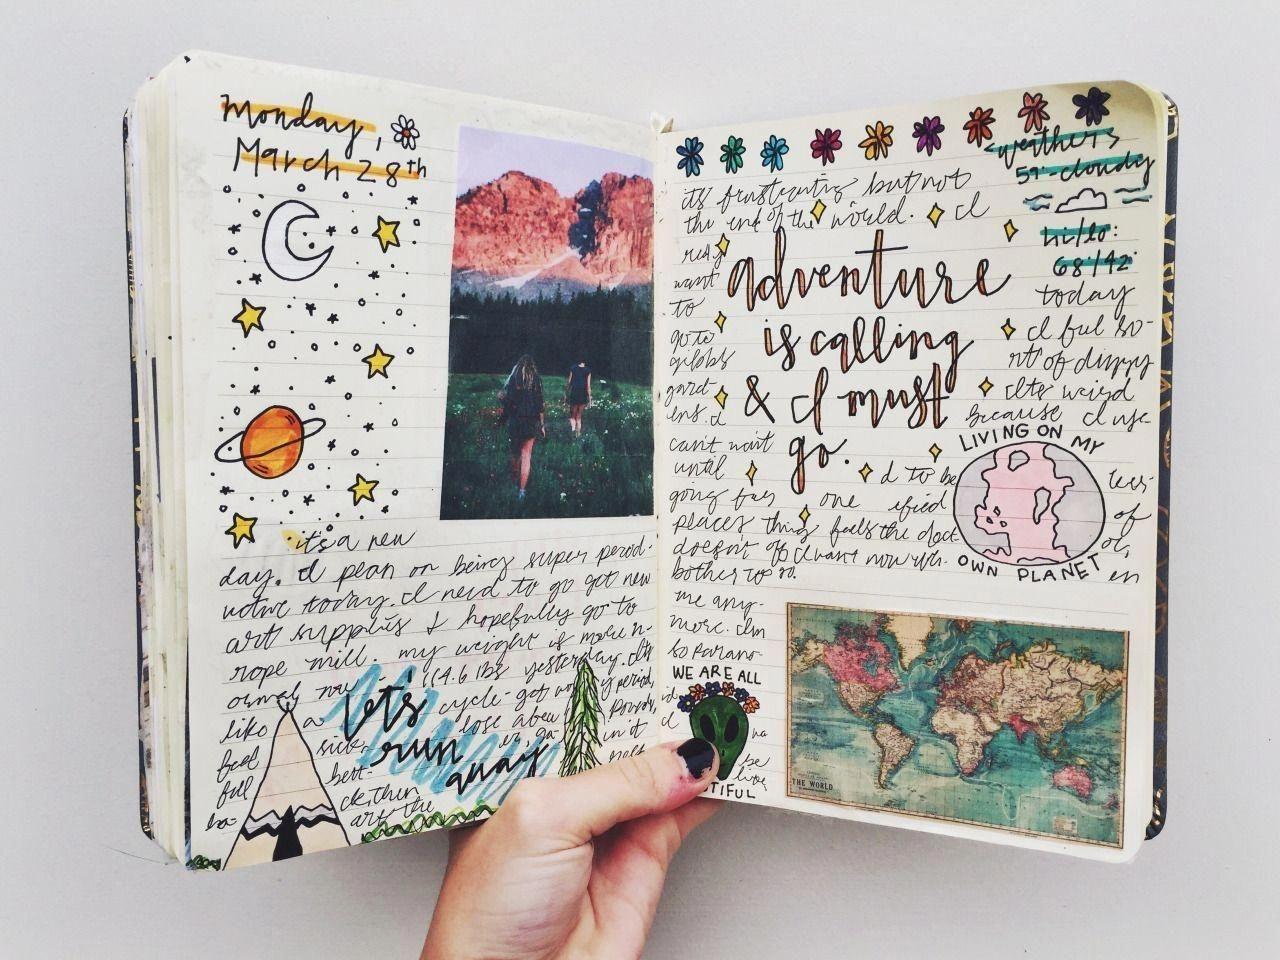 28 Great Picture Of Best Friend Scrapbook Ideas Best Friend Scrapbook Ideas 29 Best Images About T Friend Scrapbook Scrapbook For Best Friend Travel Book Diy